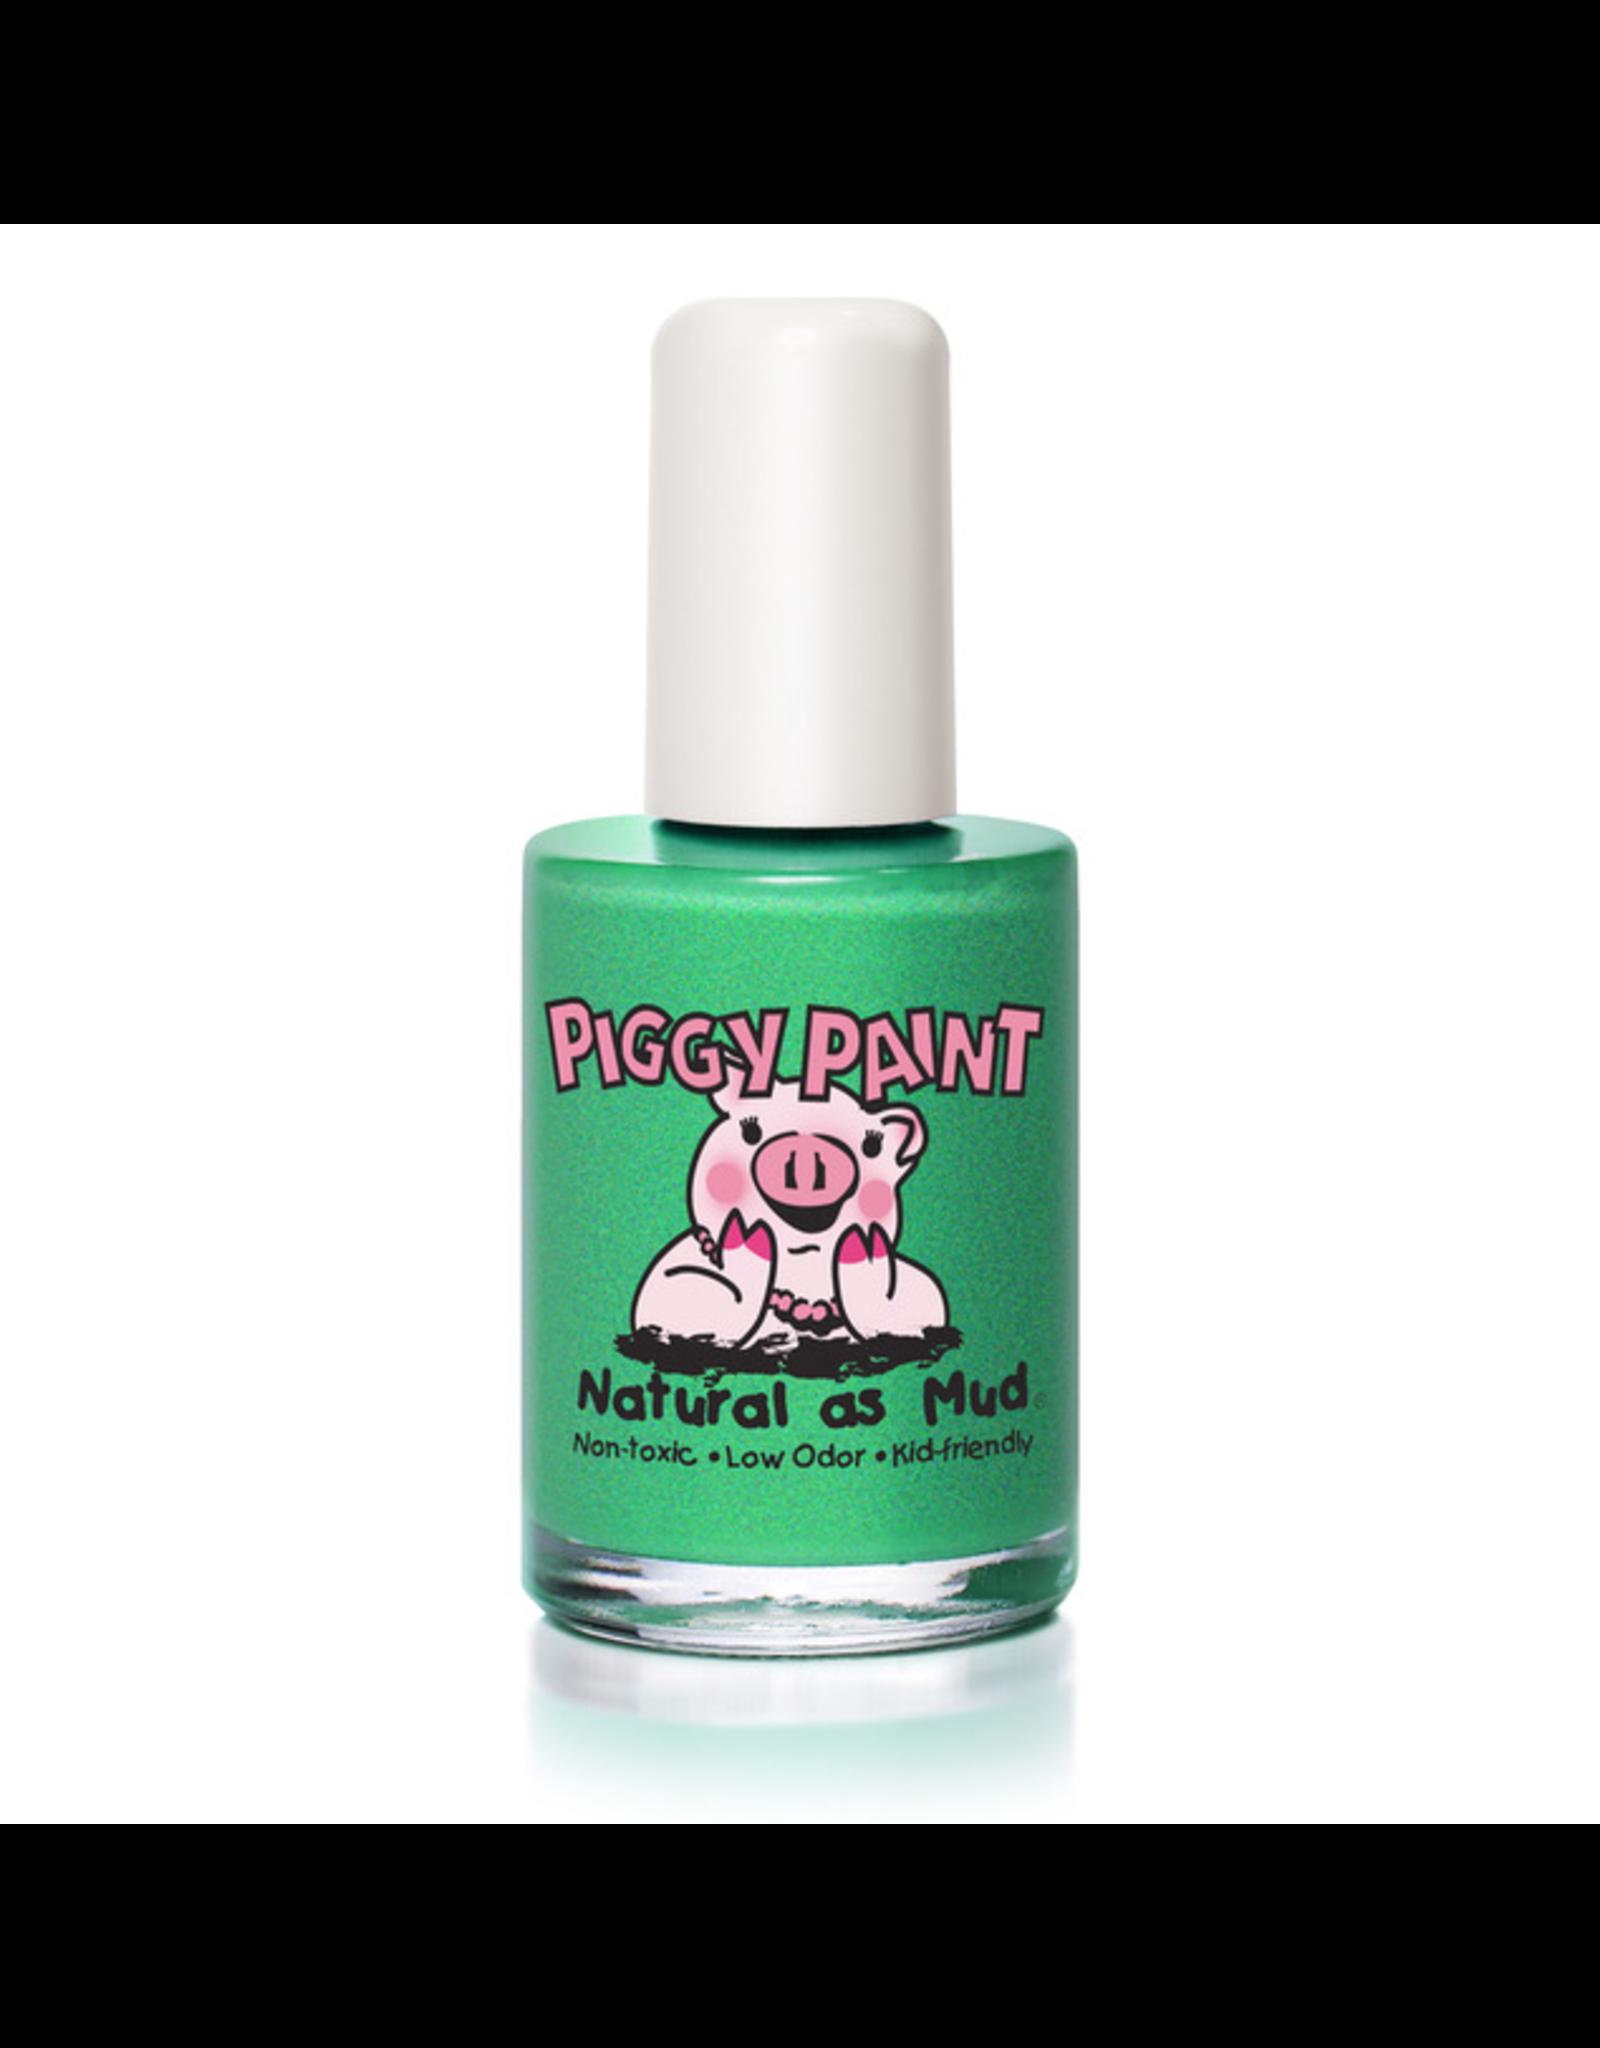 Piggy Paint Ice Cream Dream Nail Polish